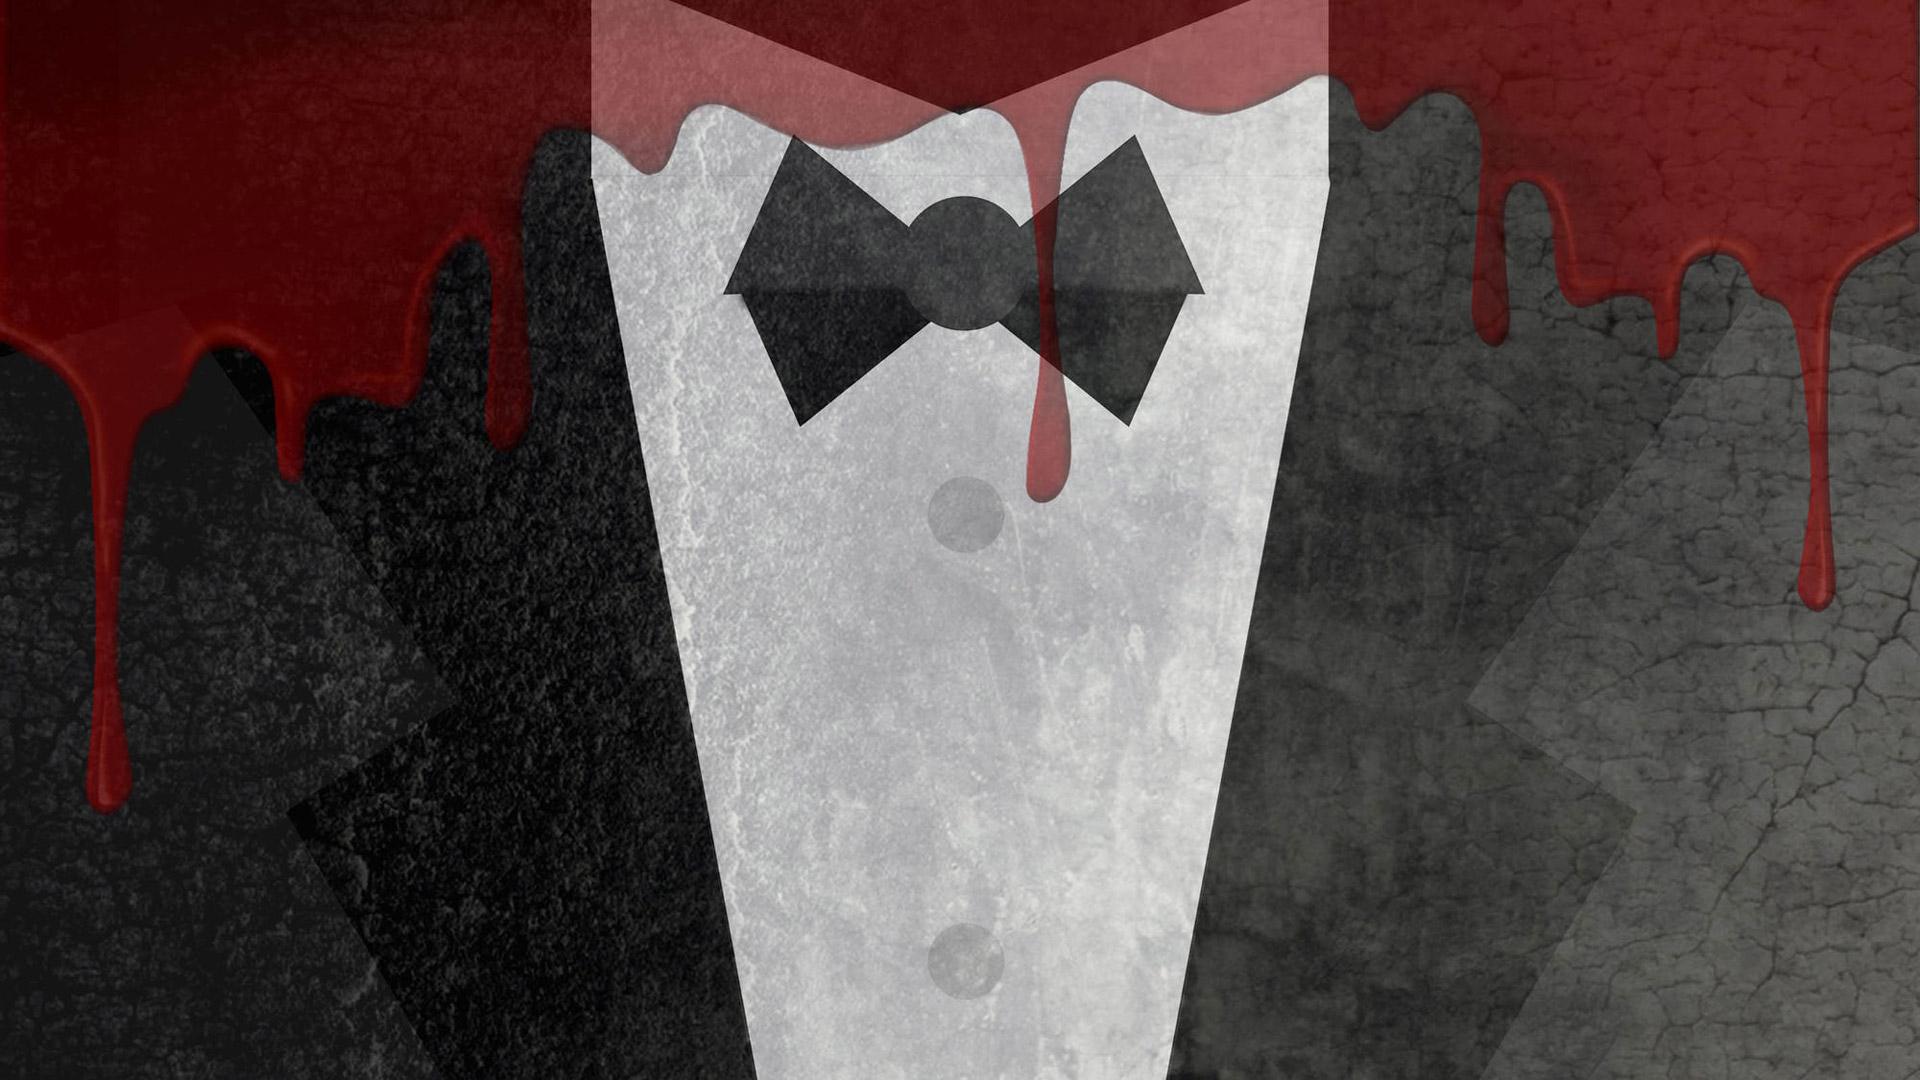 Gentleman Blood Minimalism Hd Artist 4k Wallpapers Images